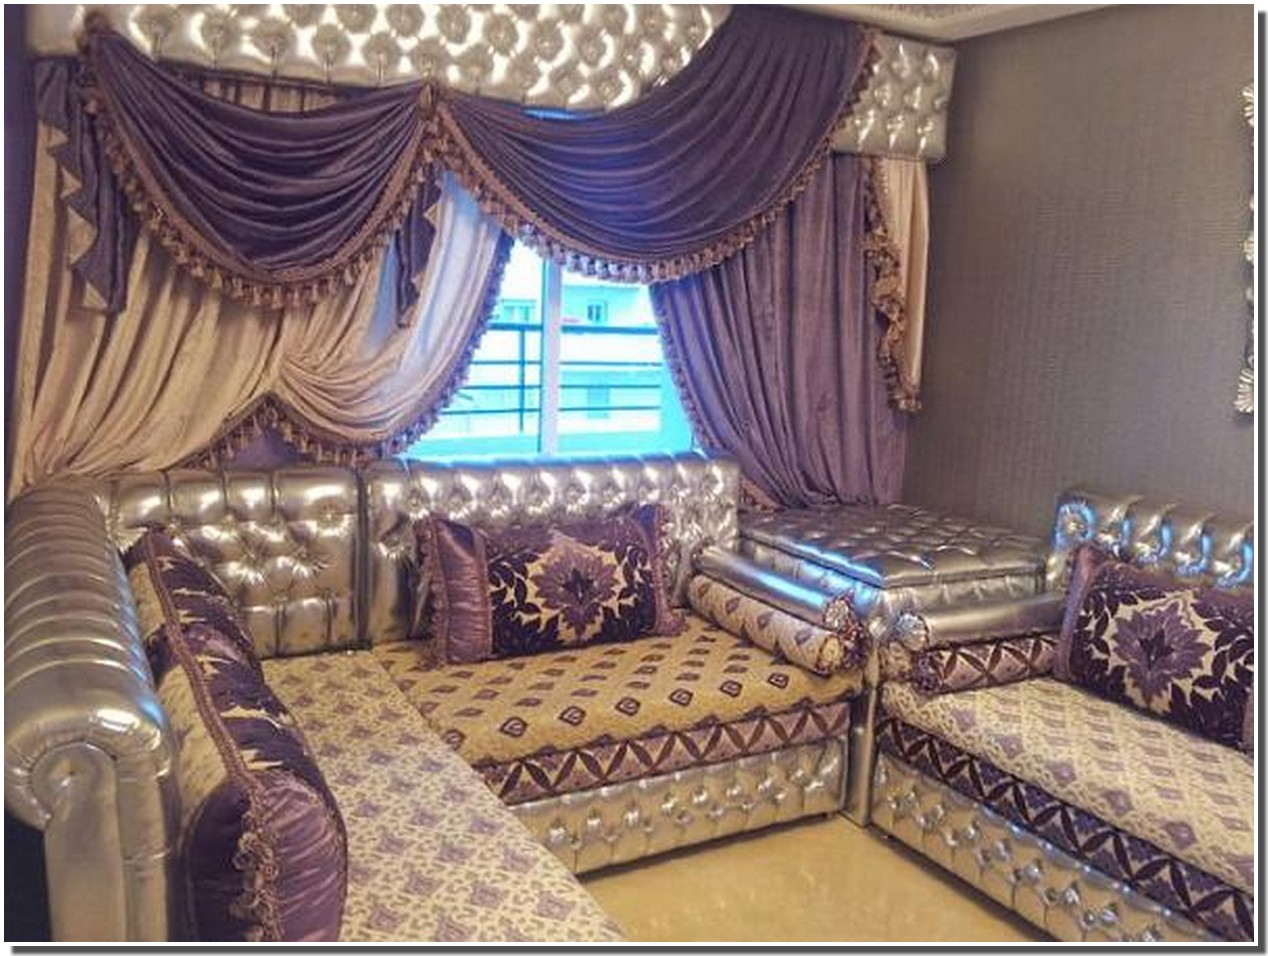 Salon Moderne Arabe - drewsebooks.com -